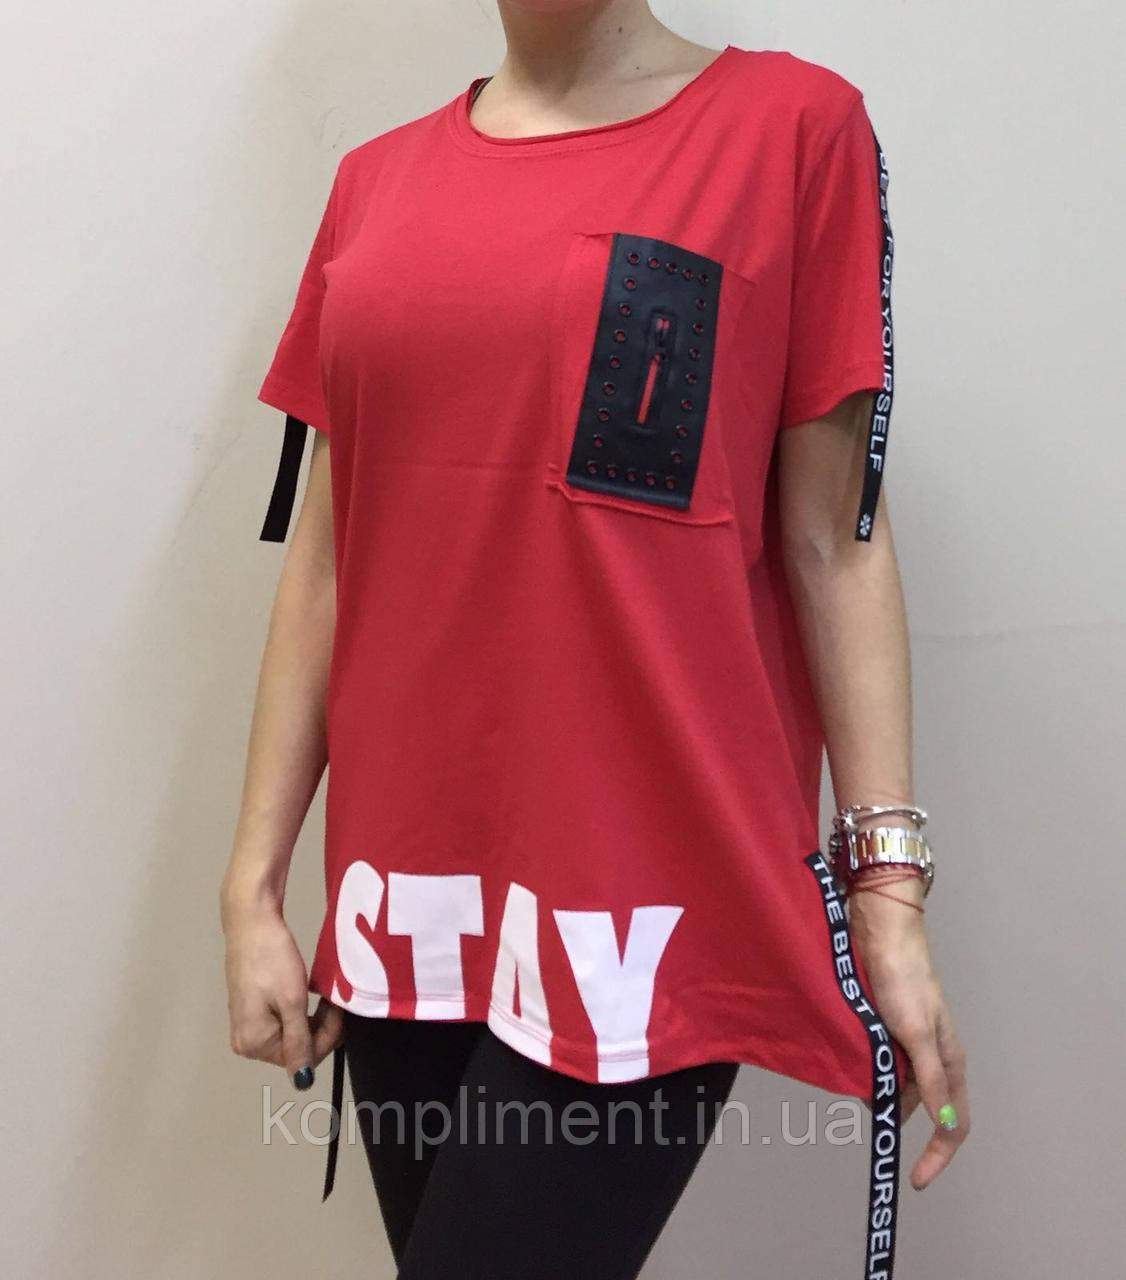 Летняя женская турецкая футболка 48-50 красная